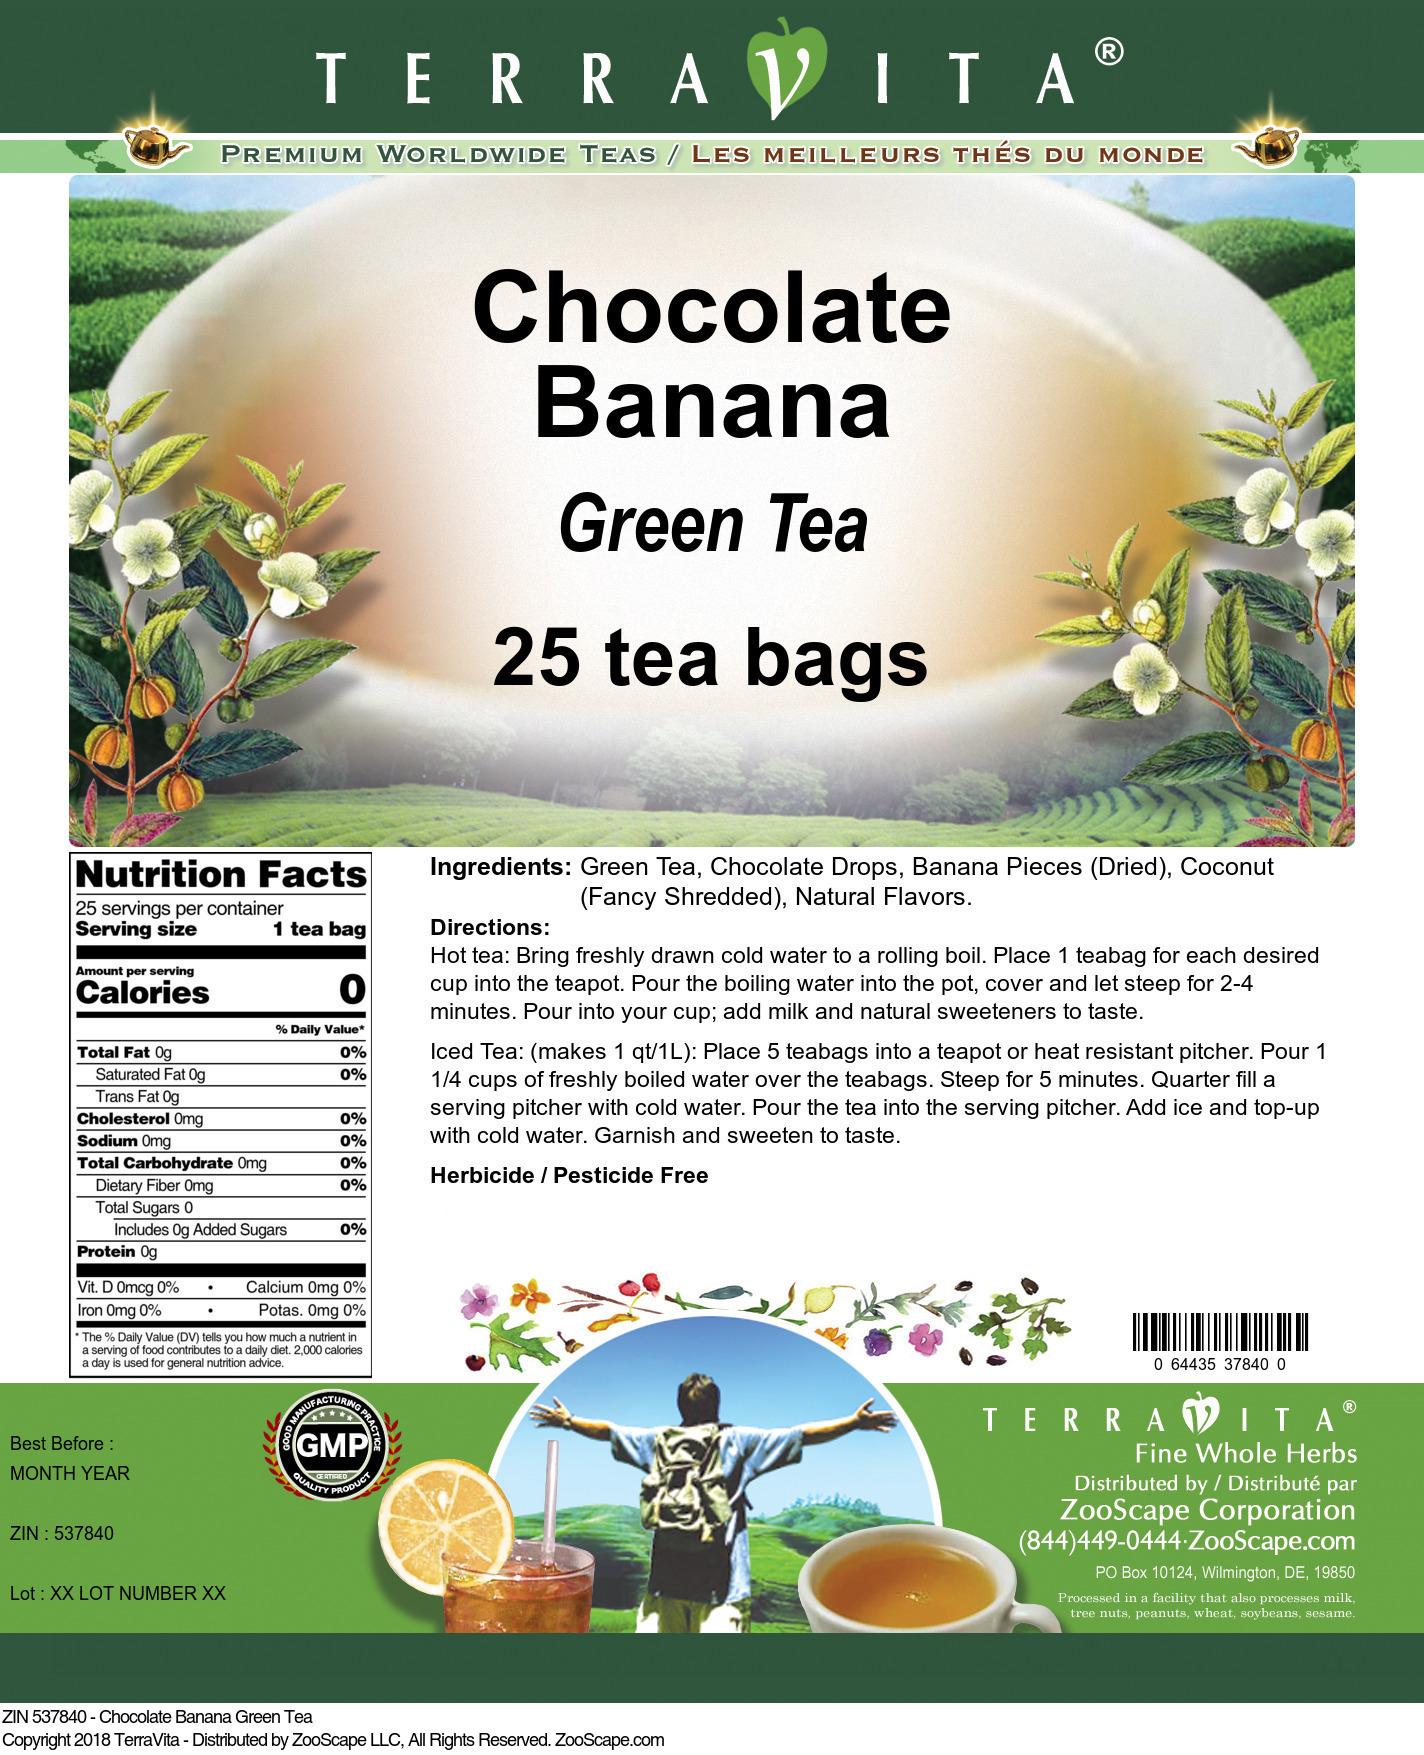 Chocolate Banana Green Tea